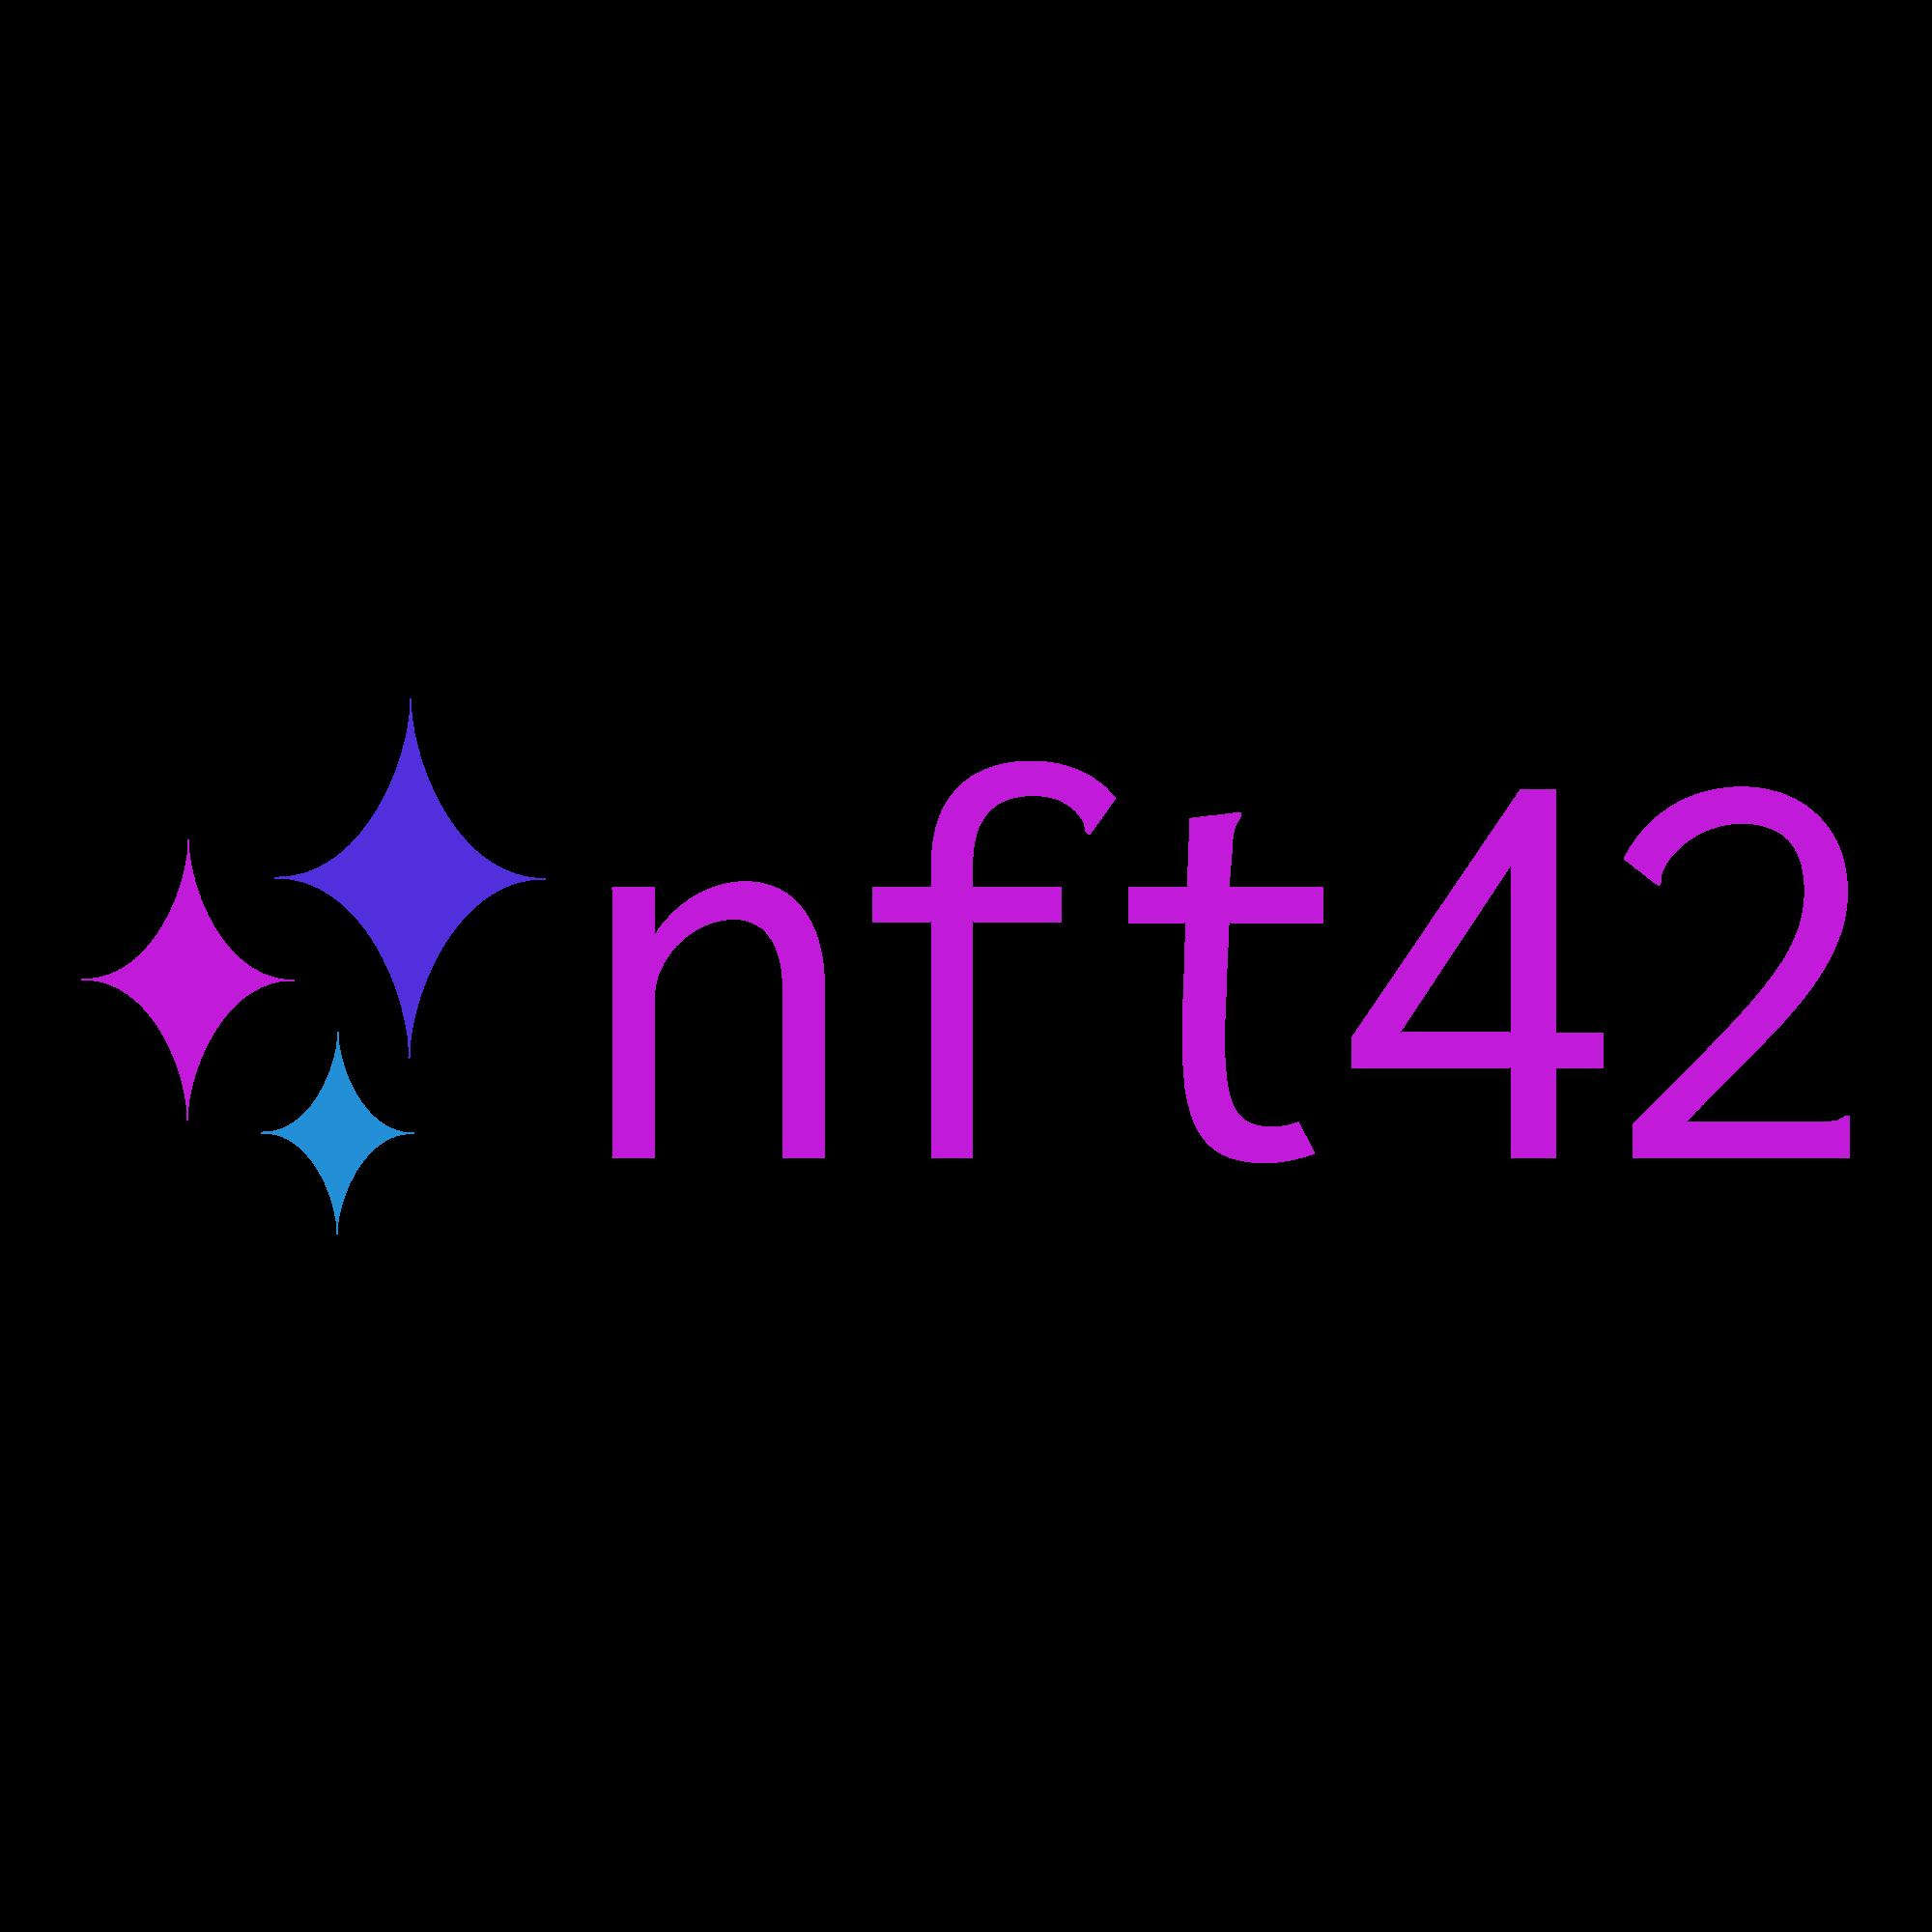 nft42 logo